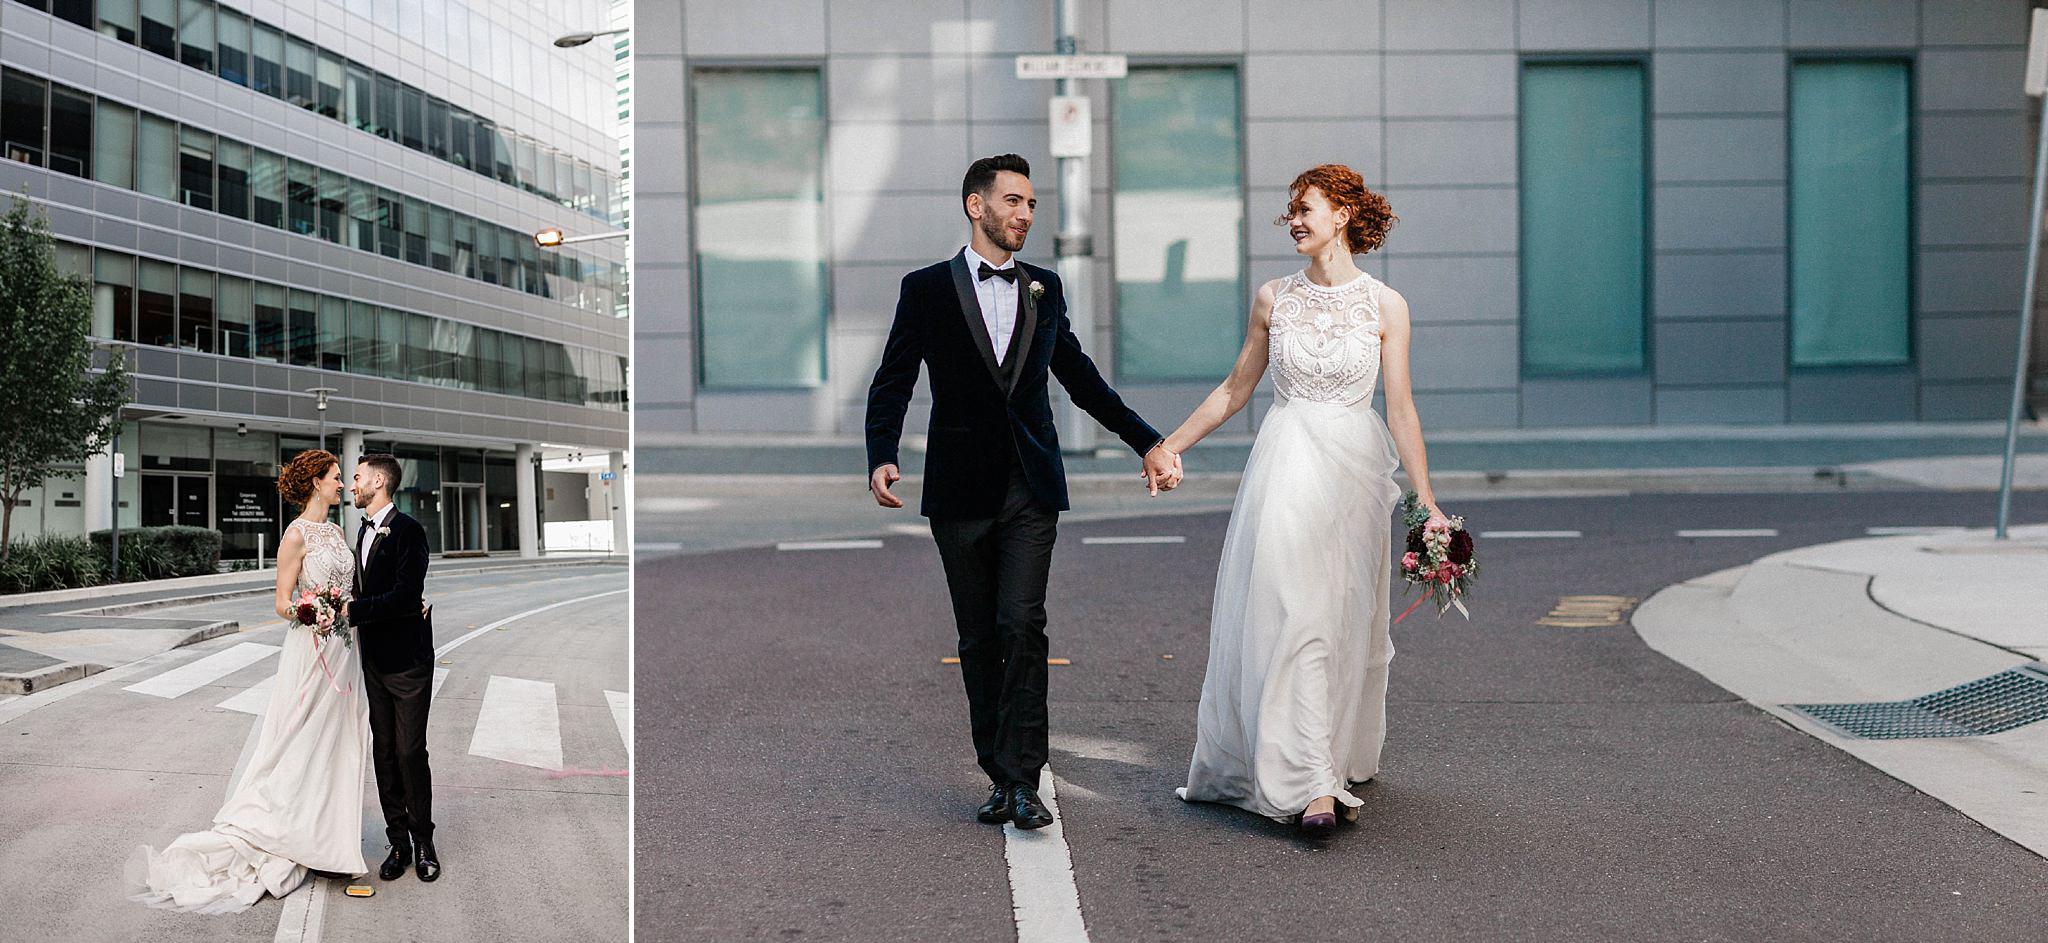 canberra wedding ceremony locations